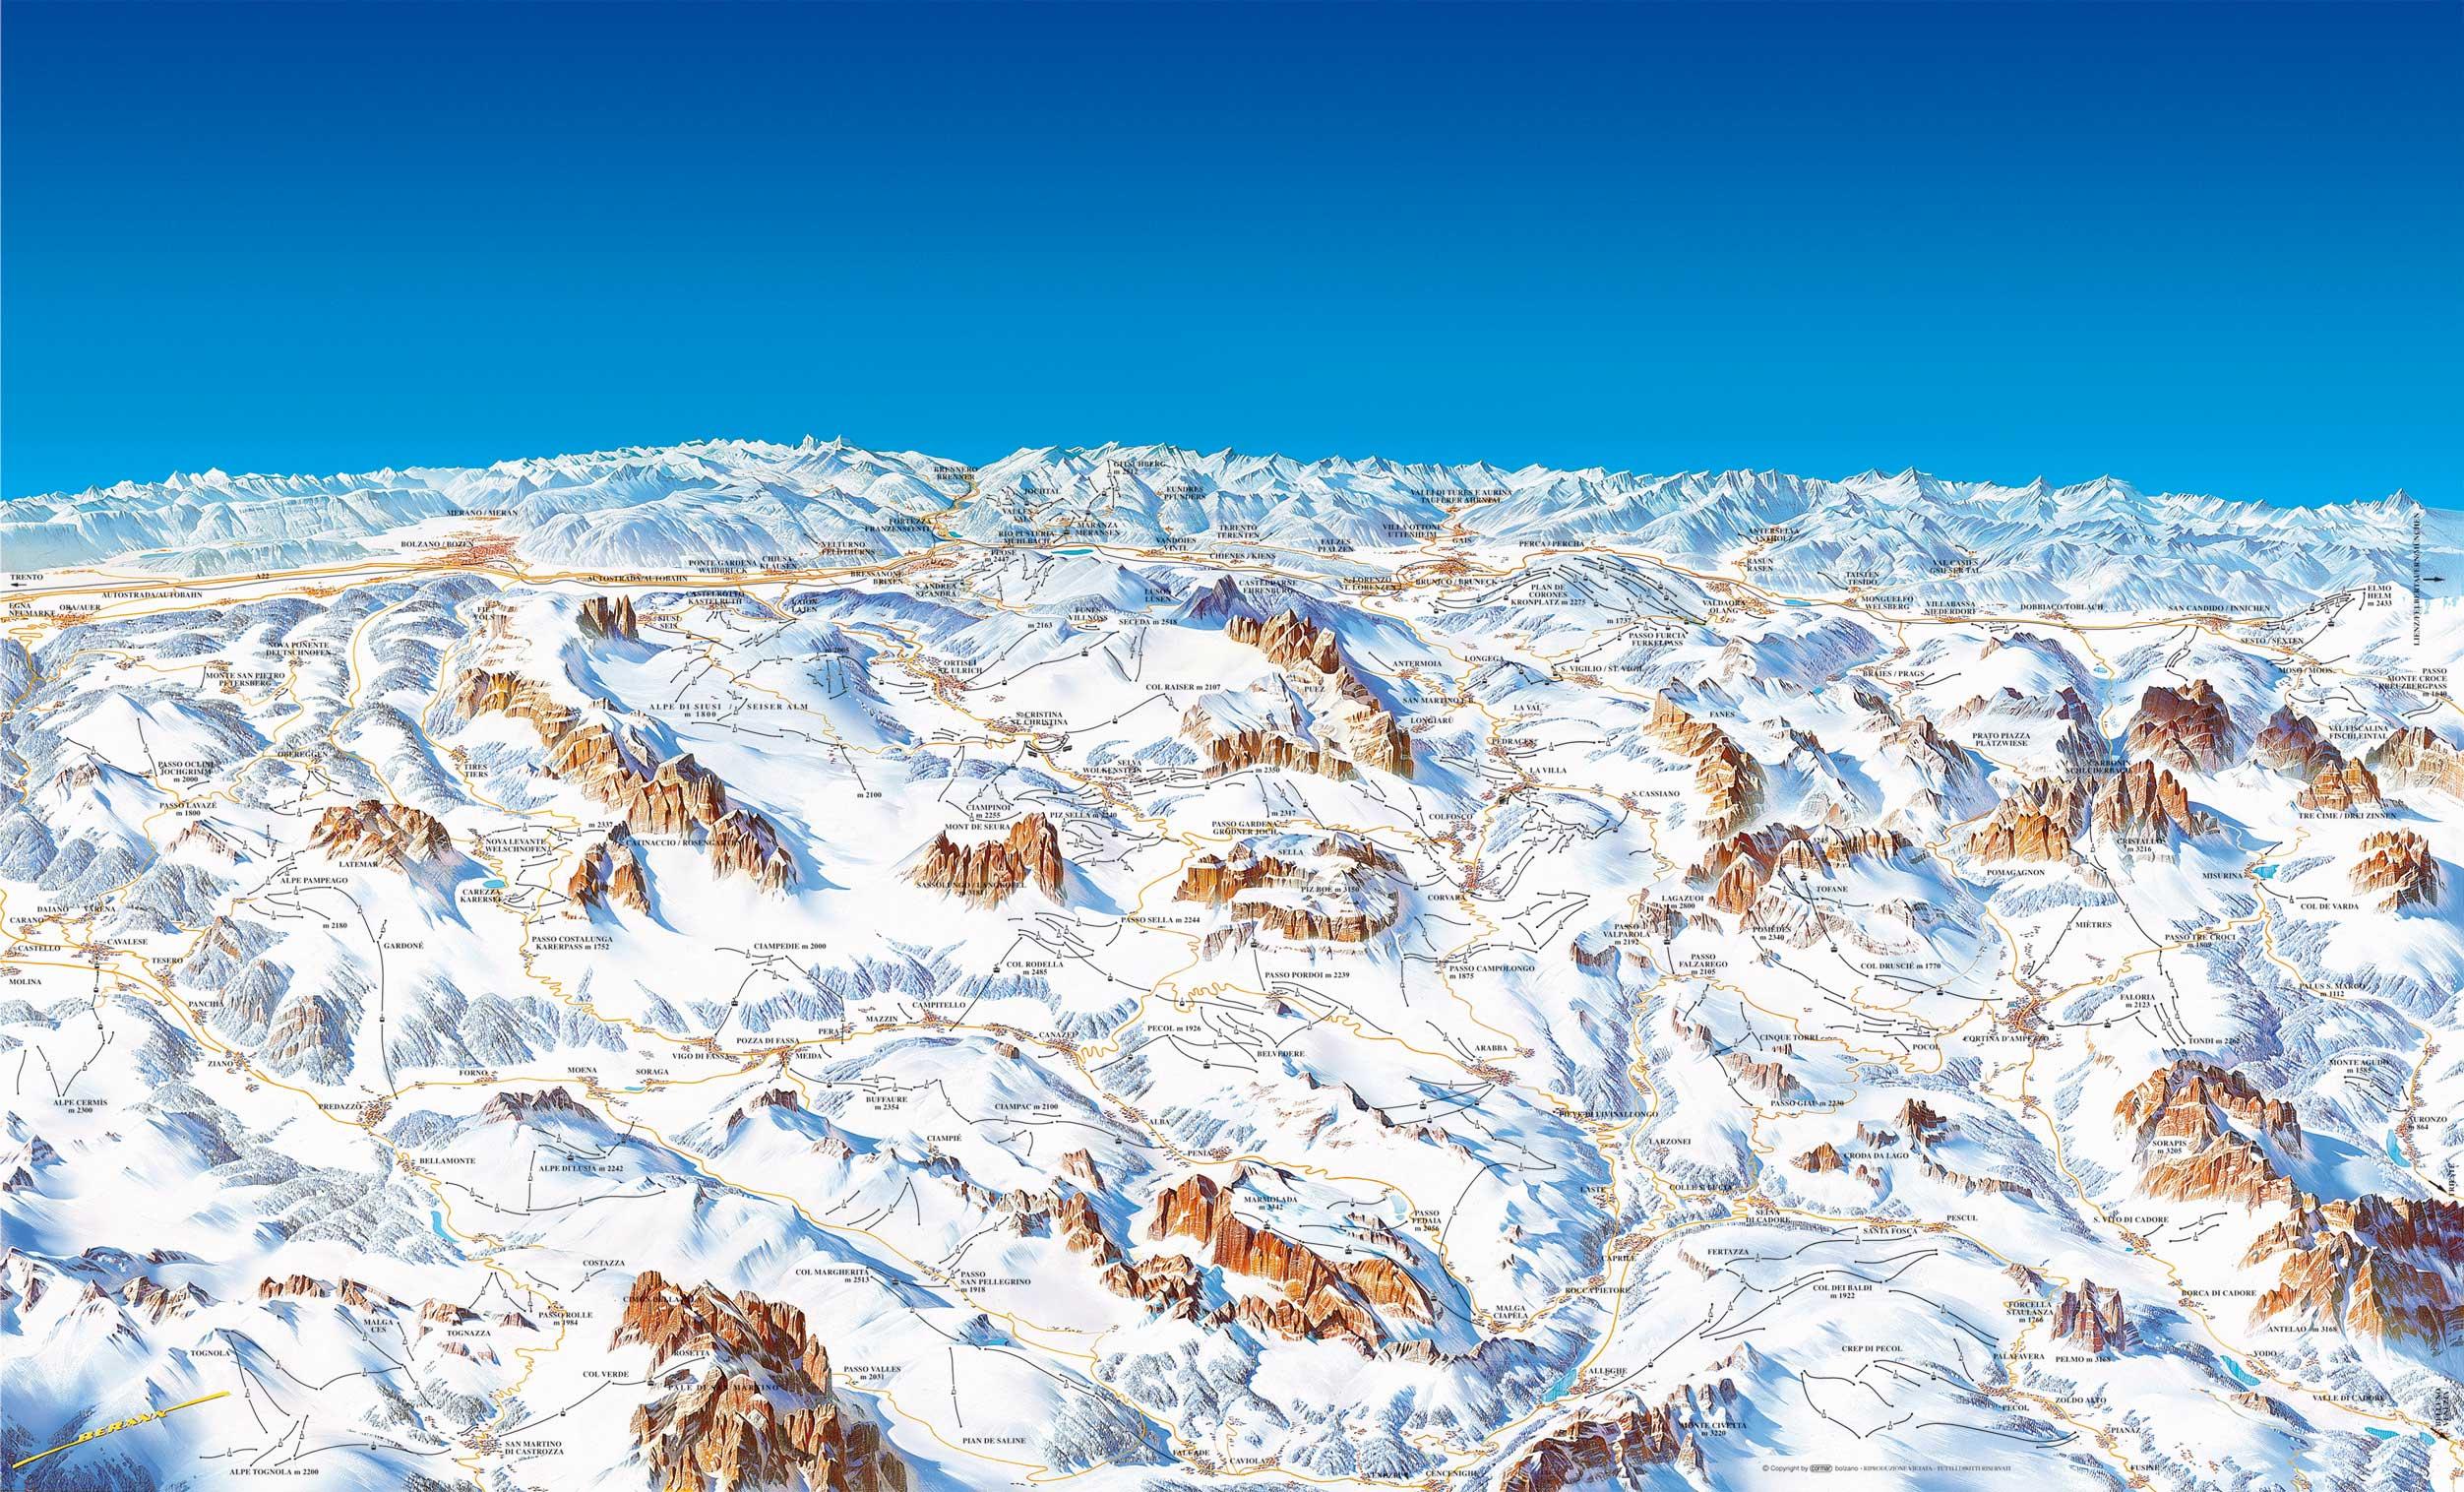 Dolomiti Superski ski map Italy Europe